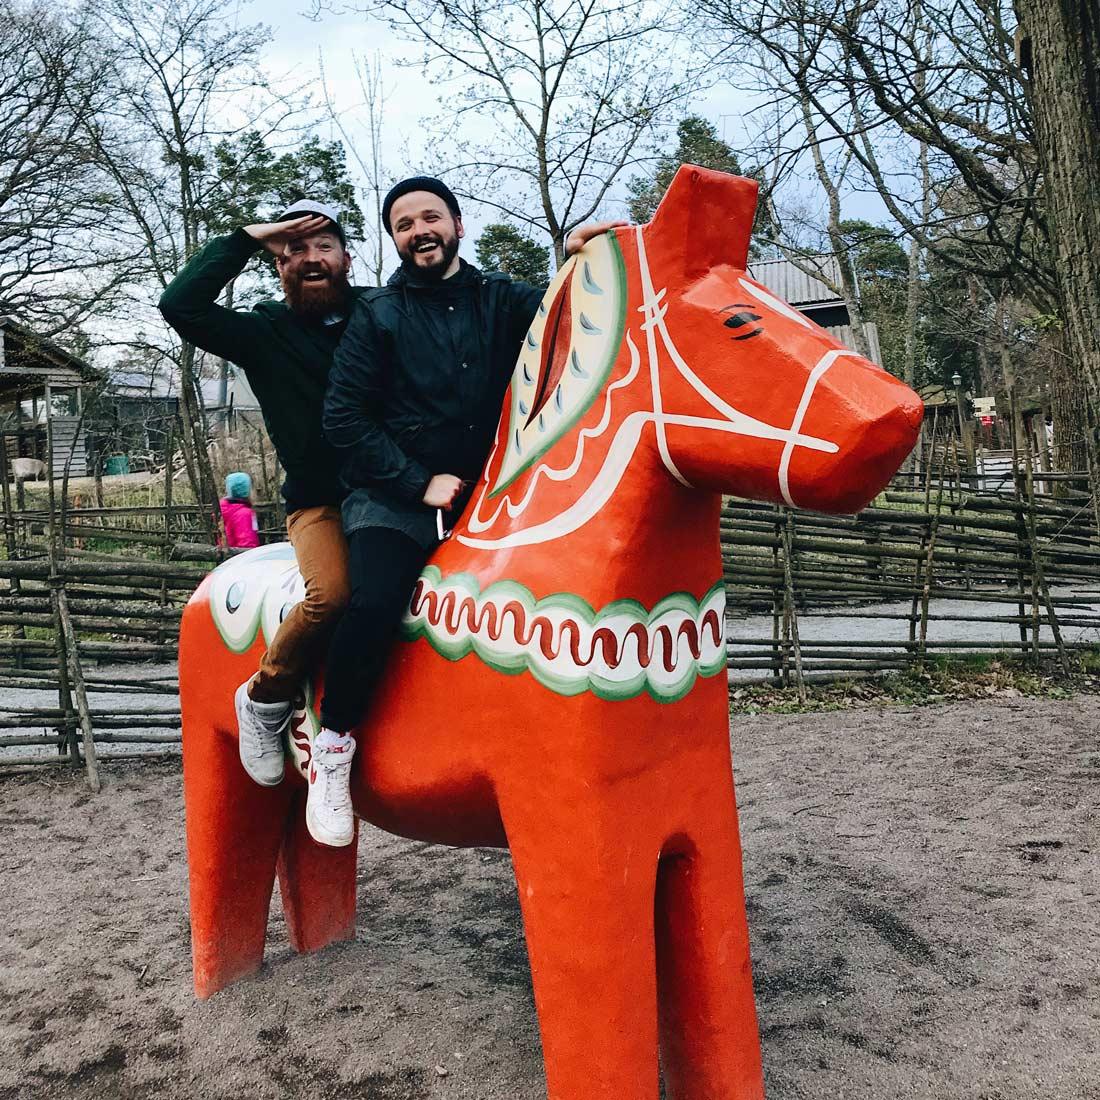 Riding a Dalecarlian or Dala horse at open-air museum Skansen   Gay Travel Tips for EuroPride 2018 Stockholm © Coupleofmen.com